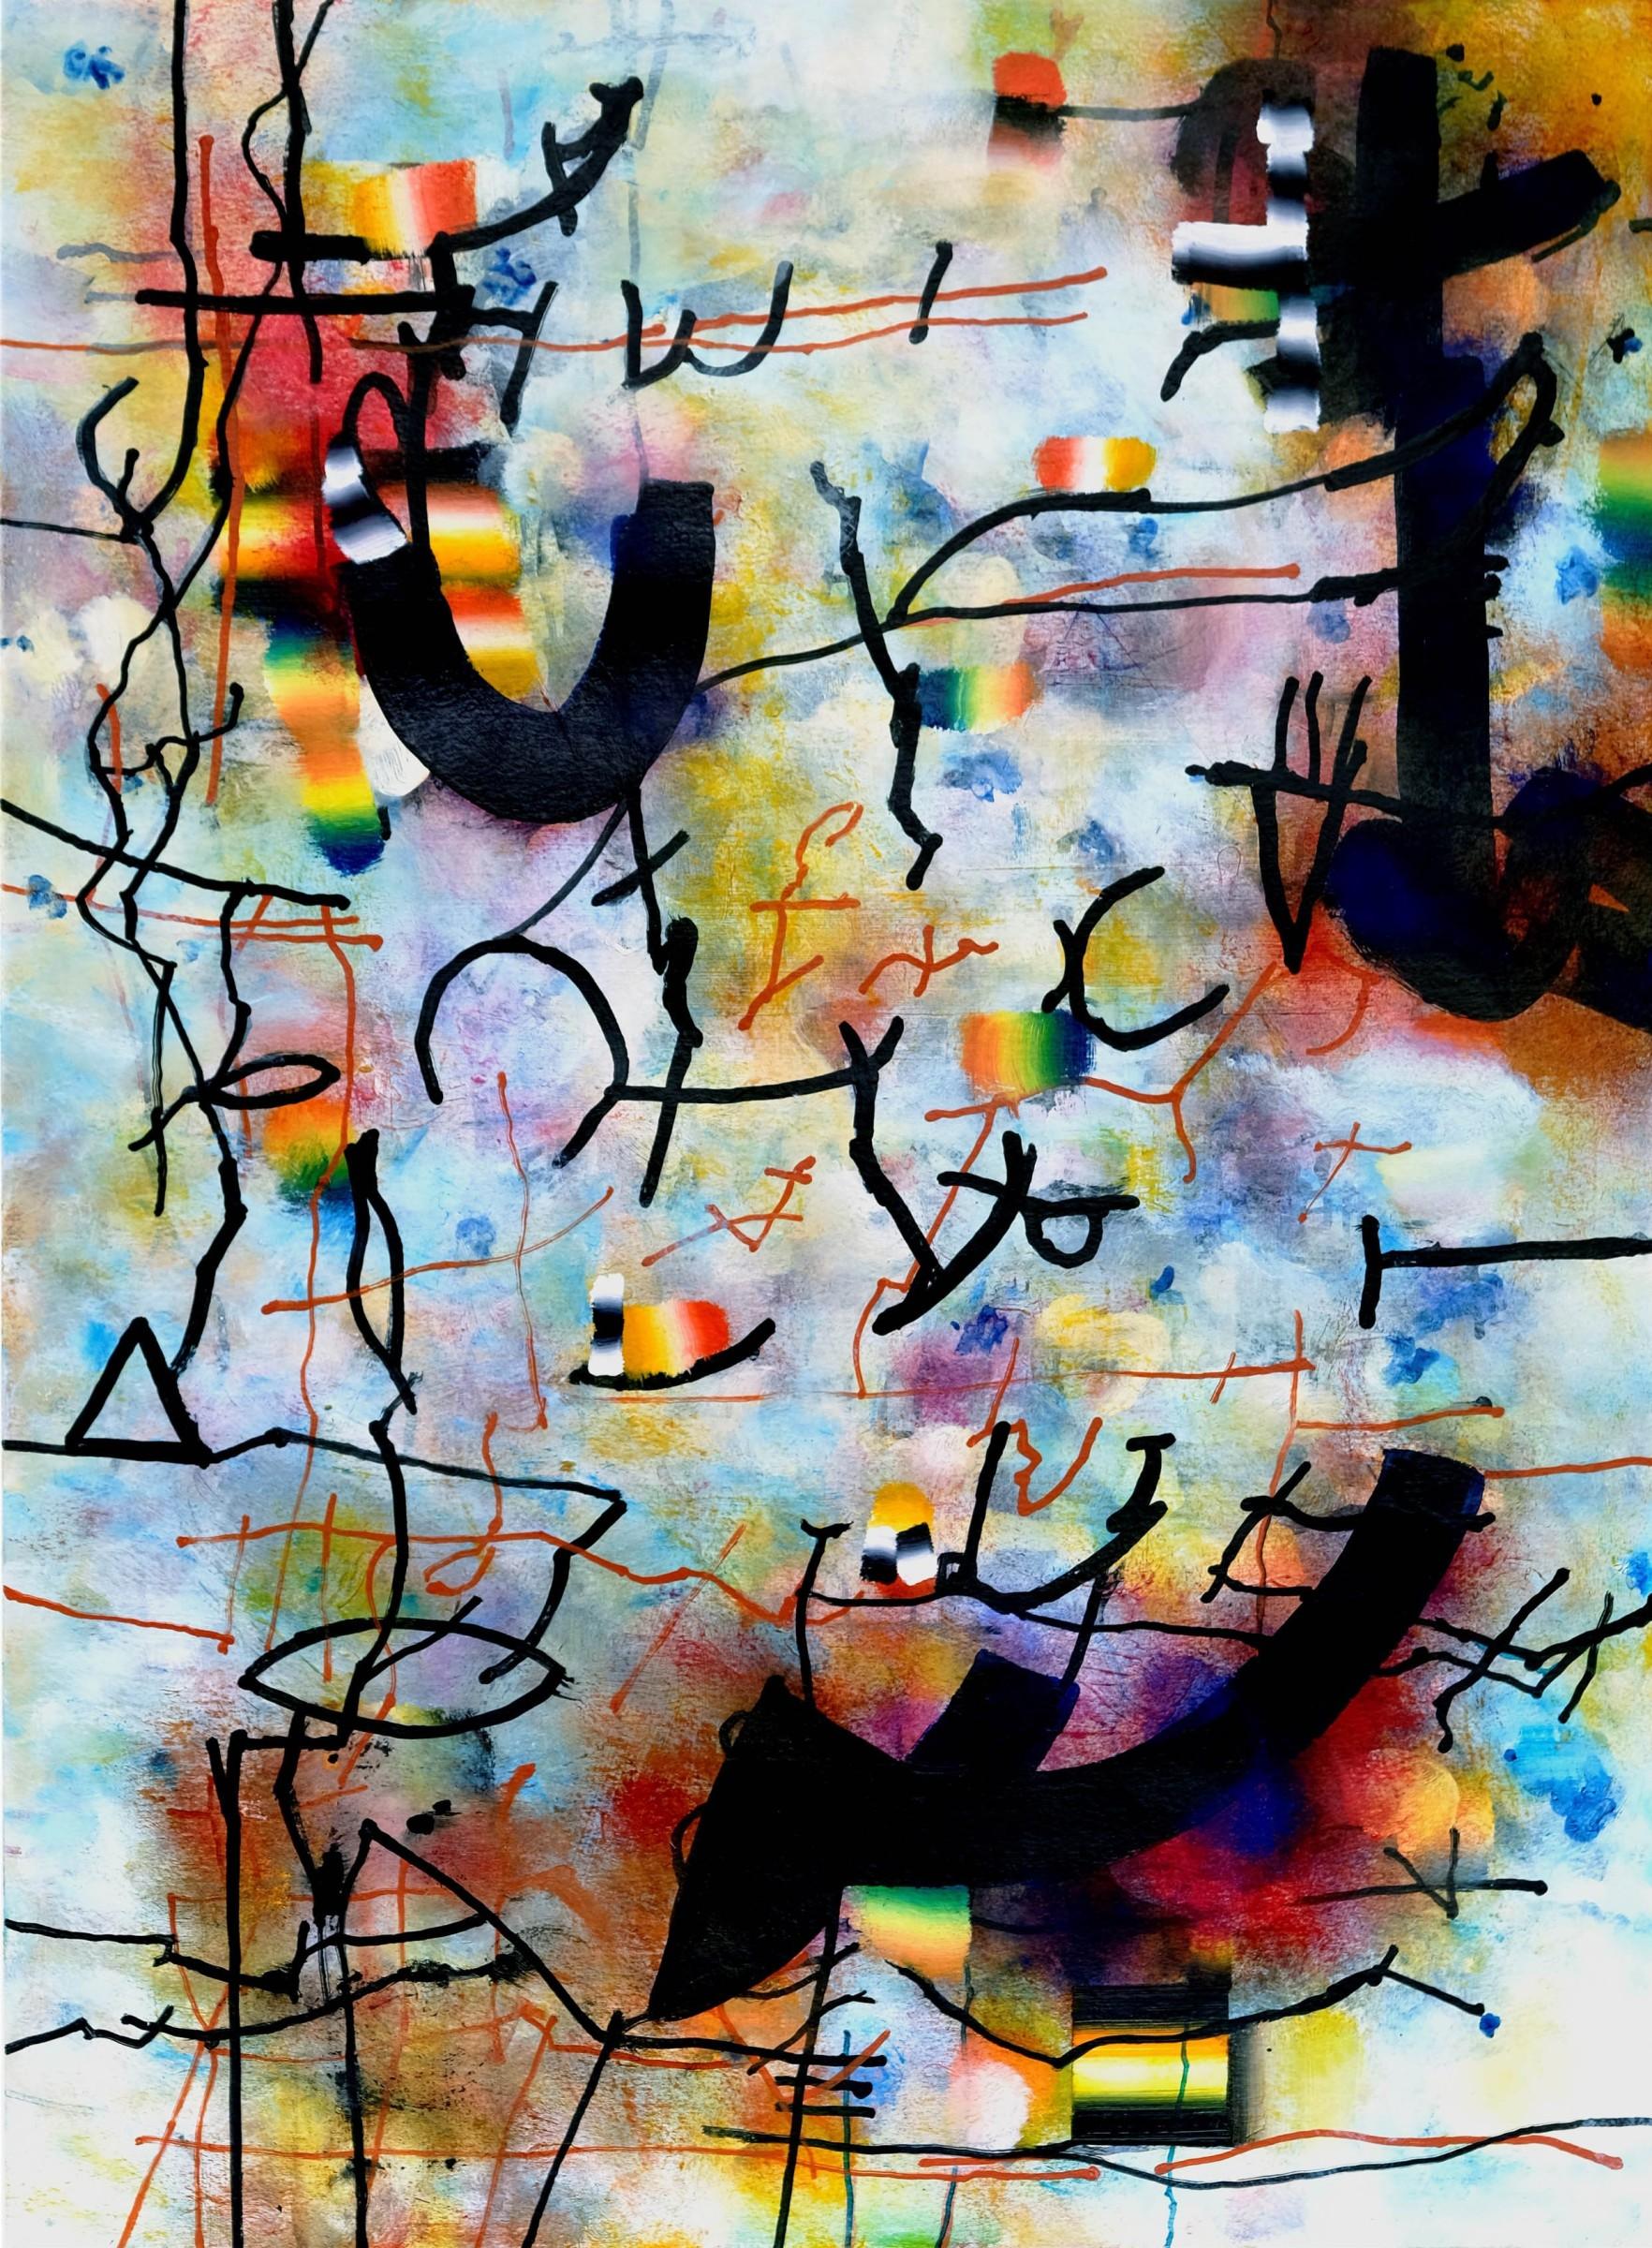 <span class=&#34;link fancybox-details-link&#34;><a href=&#34;/exhibitions/24/works/artworks_standalone10825/&#34;>View Detail Page</a></span><div class=&#34;artist&#34;><span class=&#34;artist&#34;><strong>Bill Henderson</strong></span></div><div class=&#34;title&#34;><em>Spinnaring</em></div><div class=&#34;medium&#34;>acrylic</div><div class=&#34;dimensions&#34;>90 x 78</div>